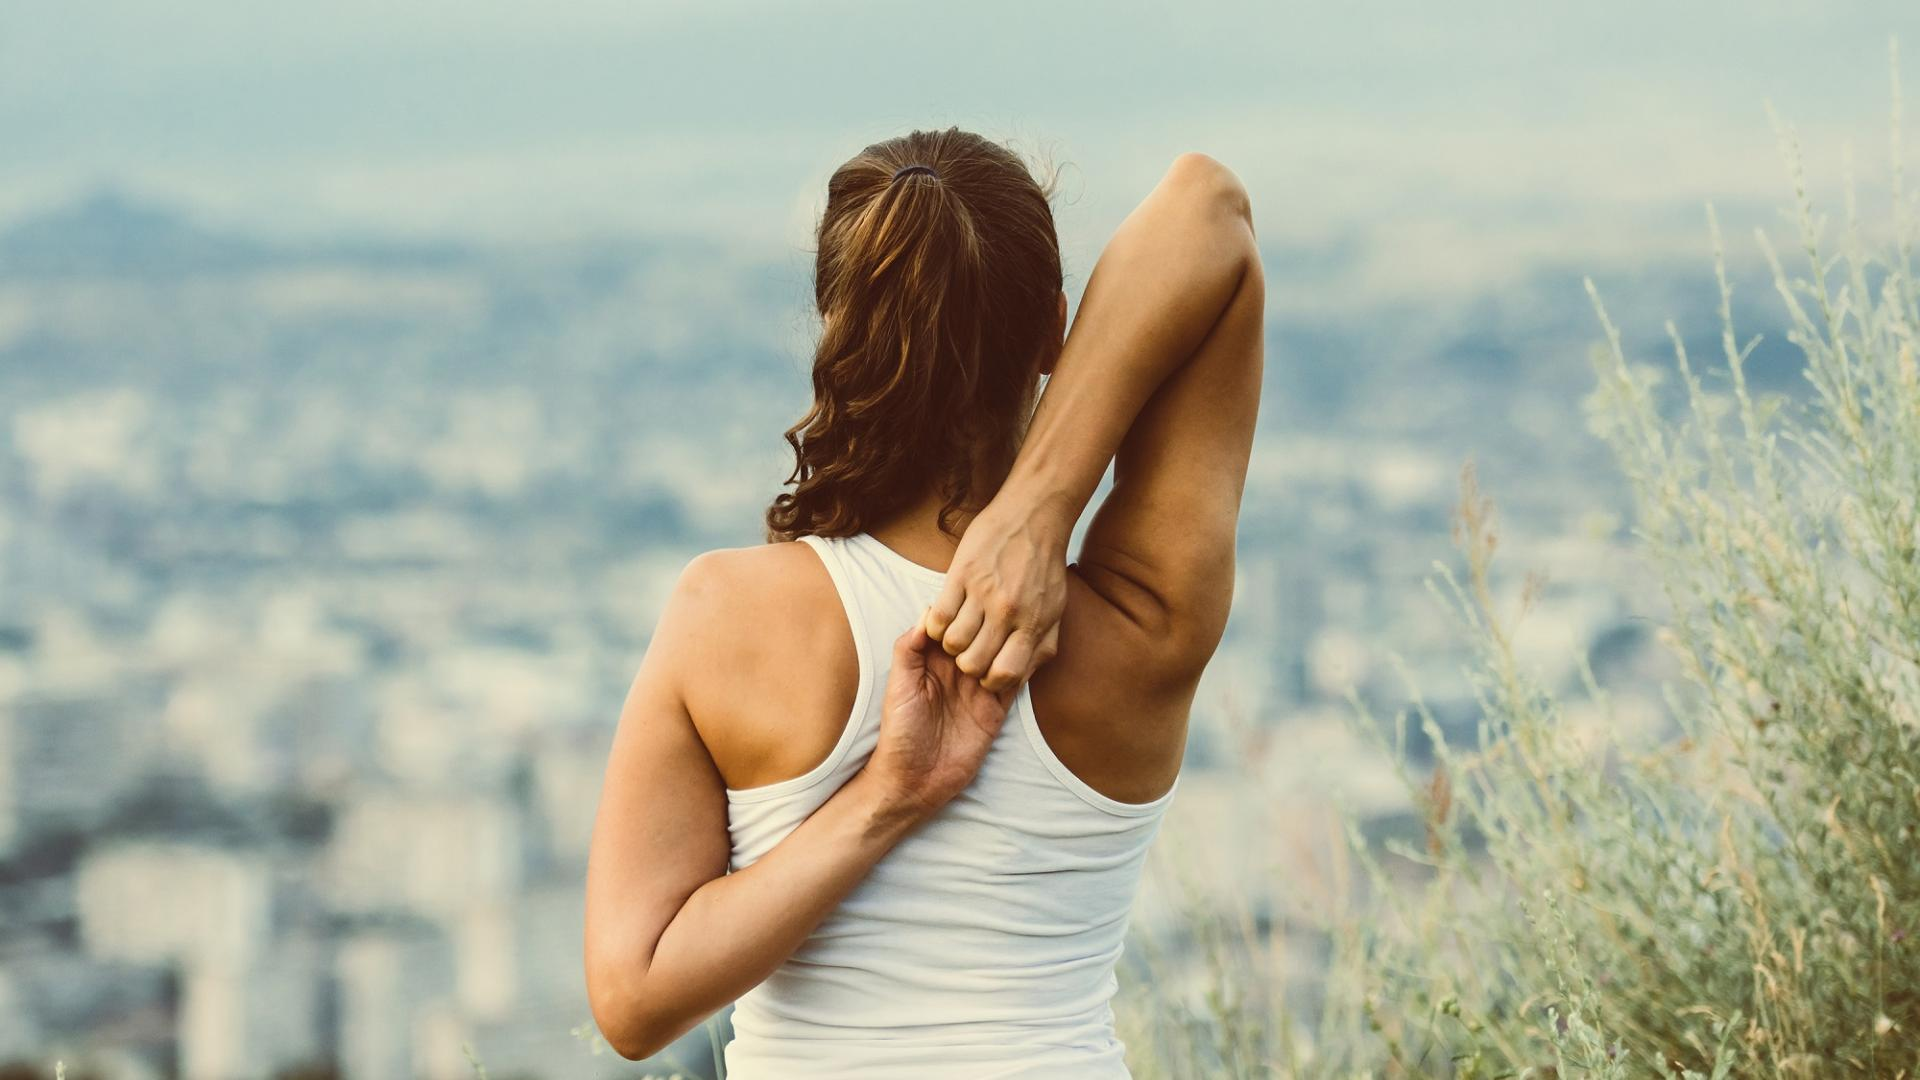 Frau Yoga Blick auf Stadt